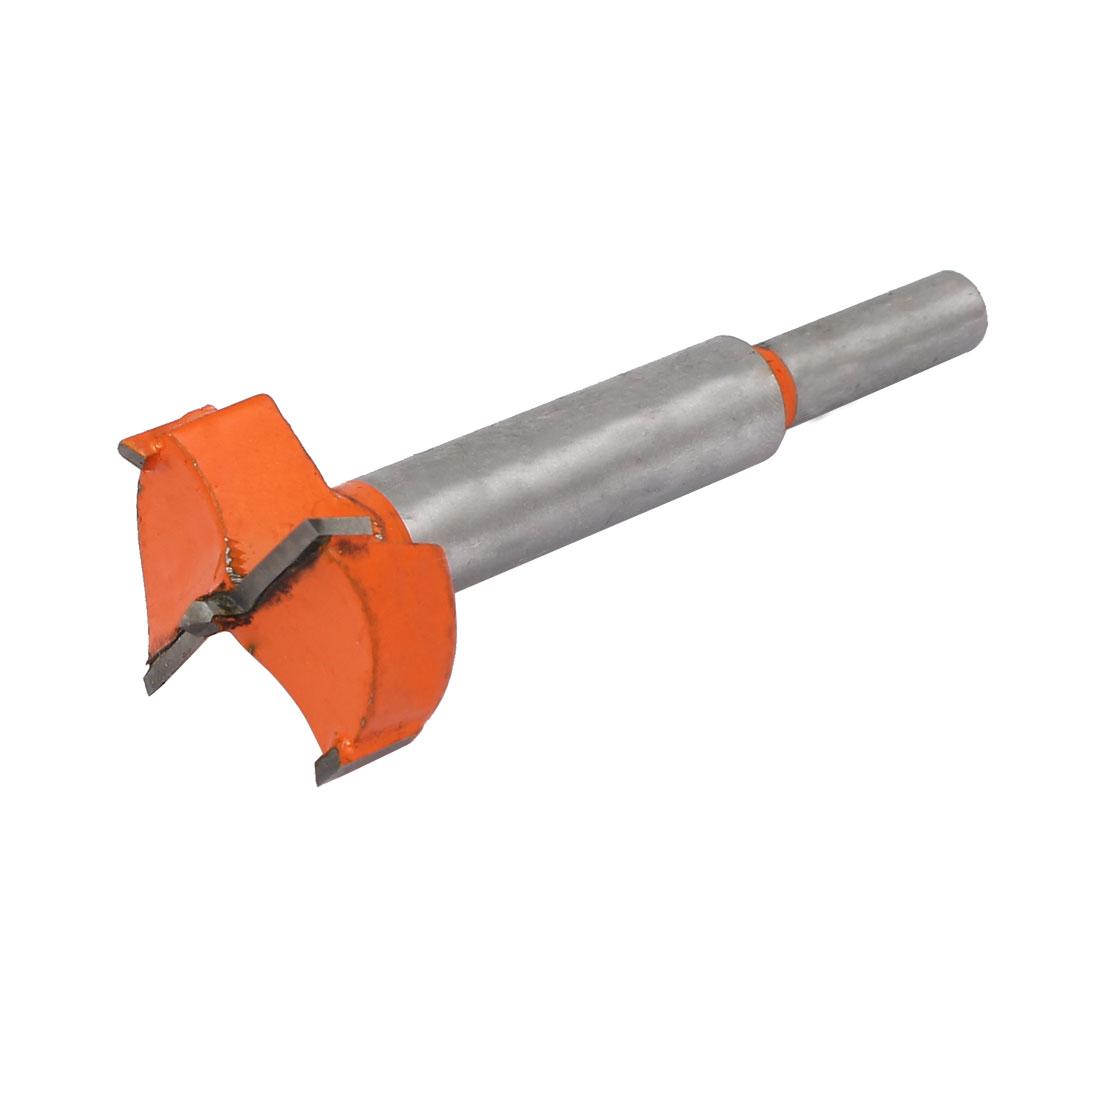 32mm Dia Carbide Tip Wood Drilling Cutting Hinge Boring Bit Drill Tool Orange